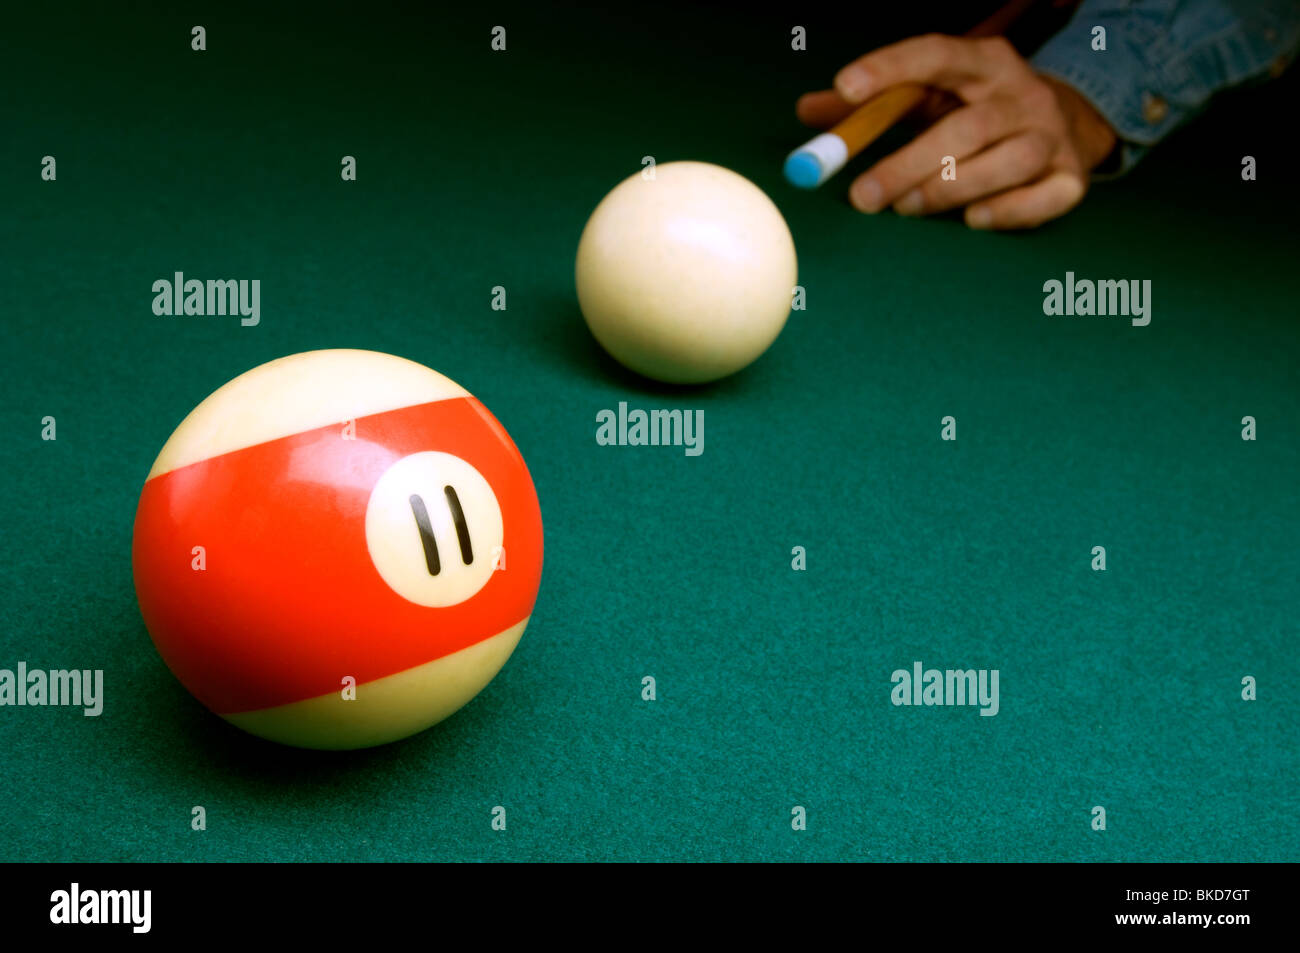 Billiard still life - Stock Image